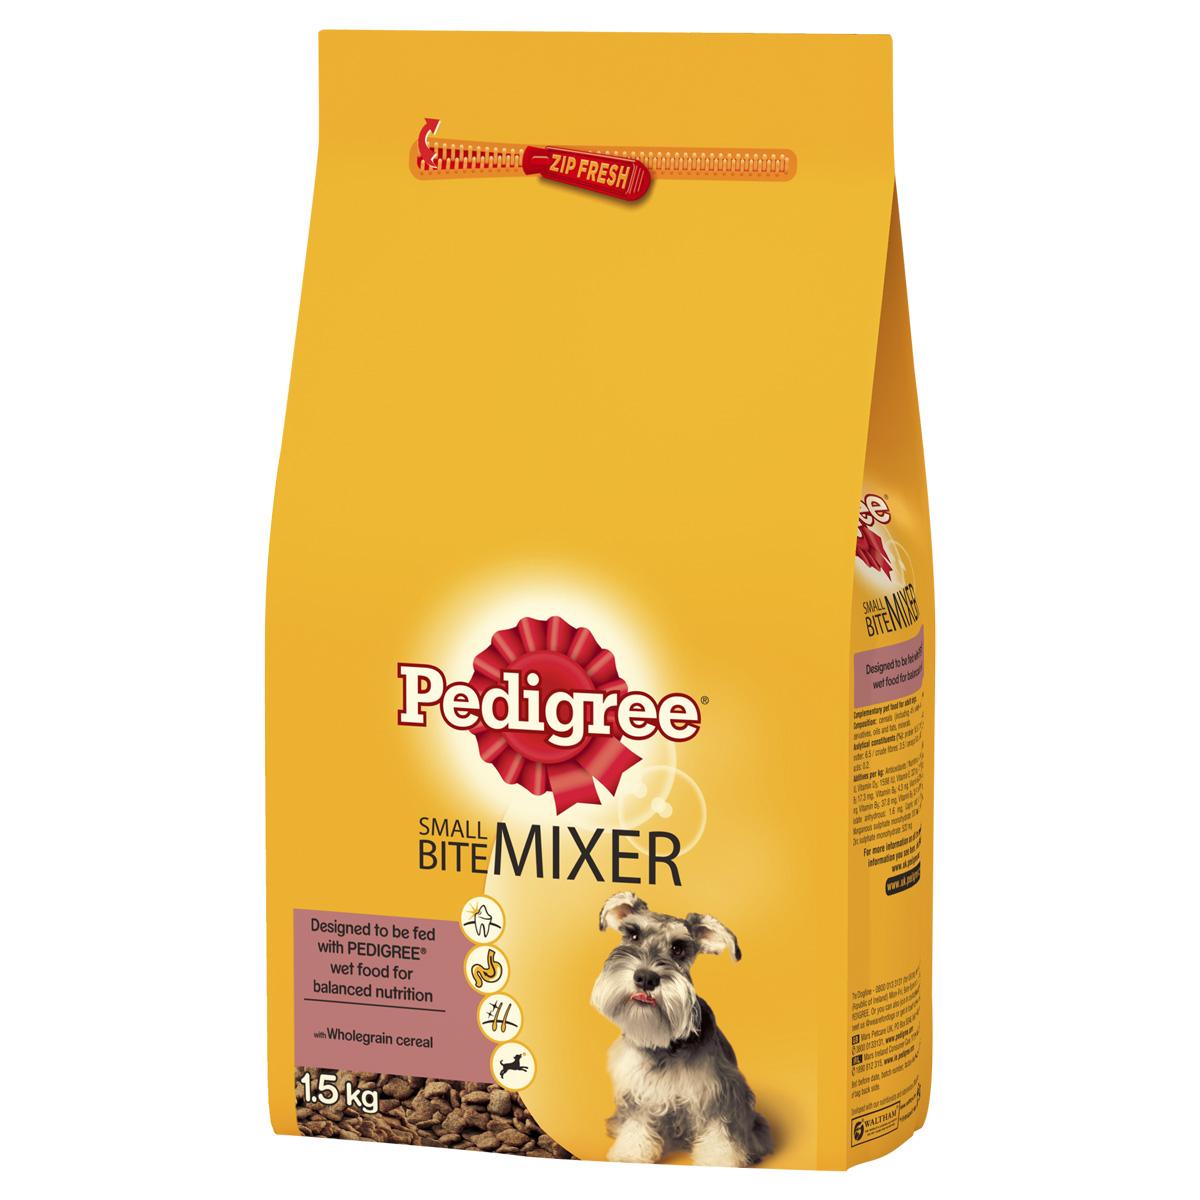 Pedigree Wet Dog Food Review